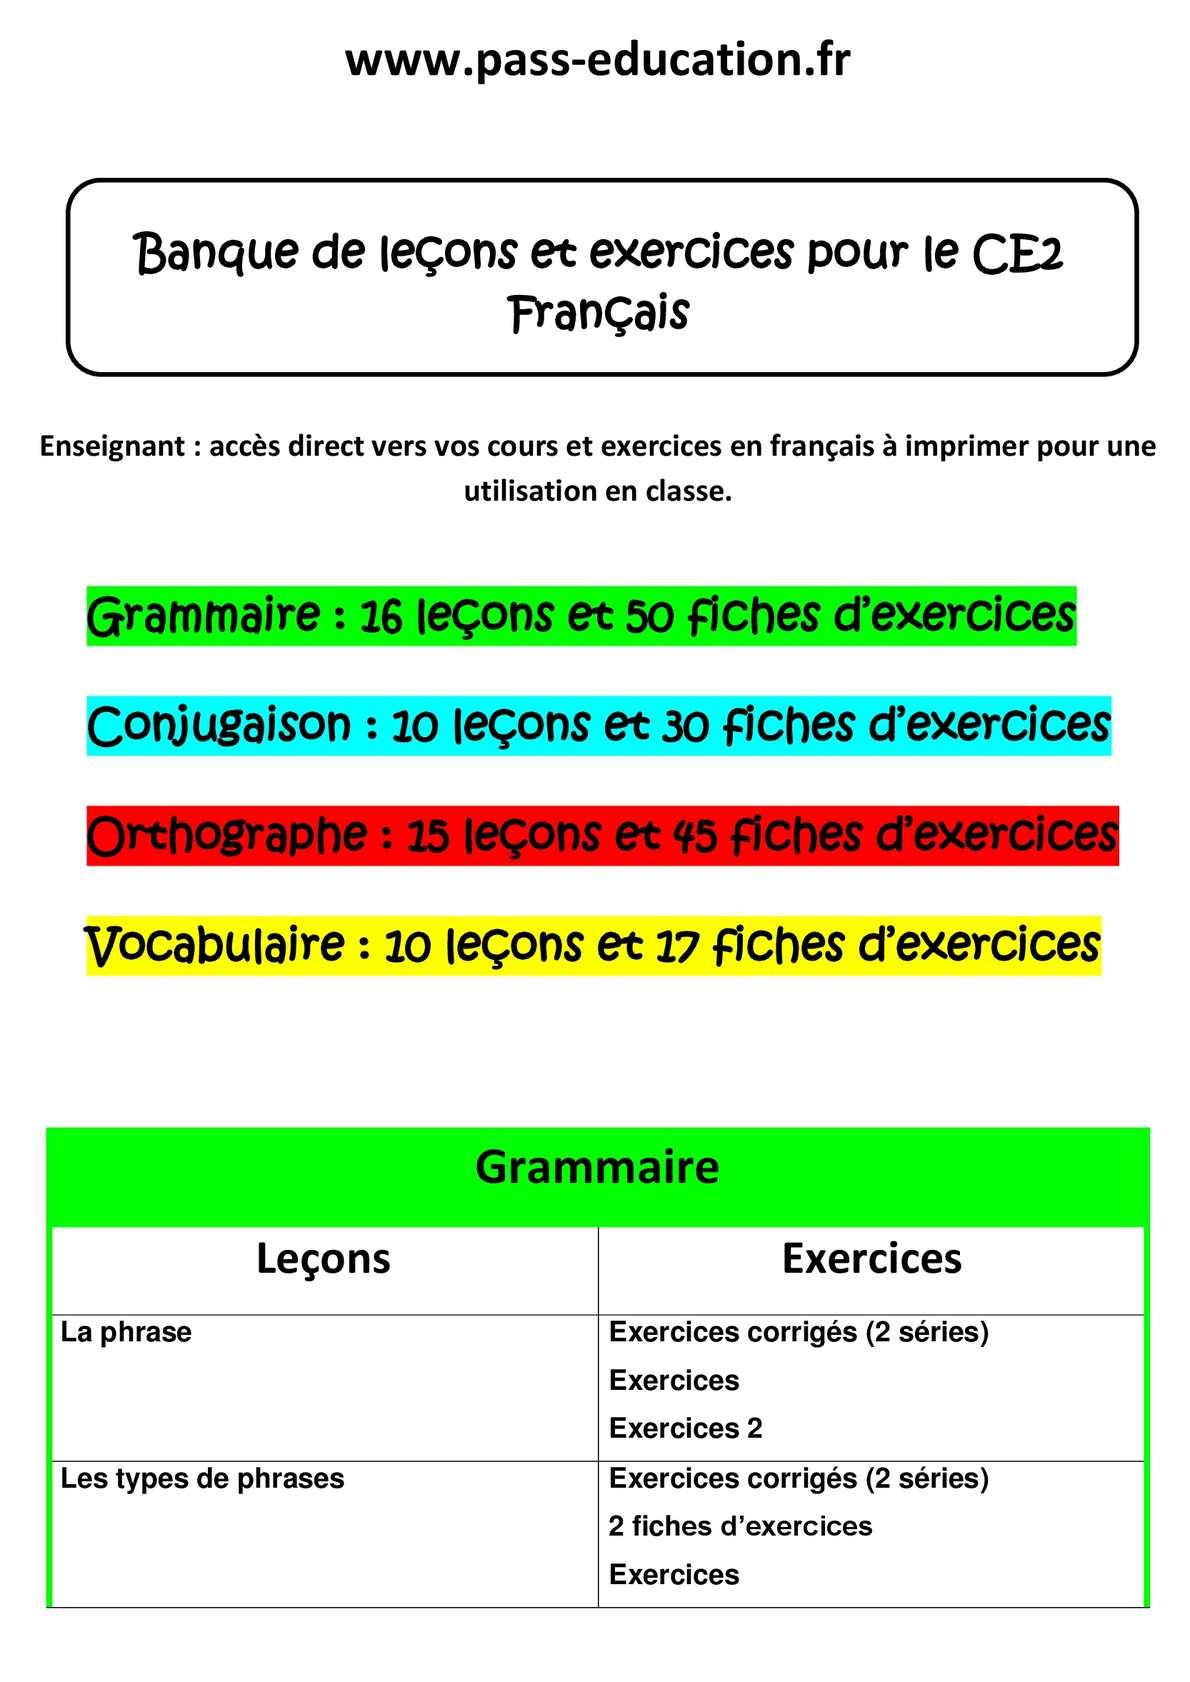 Calameo Ce2 Francais Banque De Lecons Et Exercices